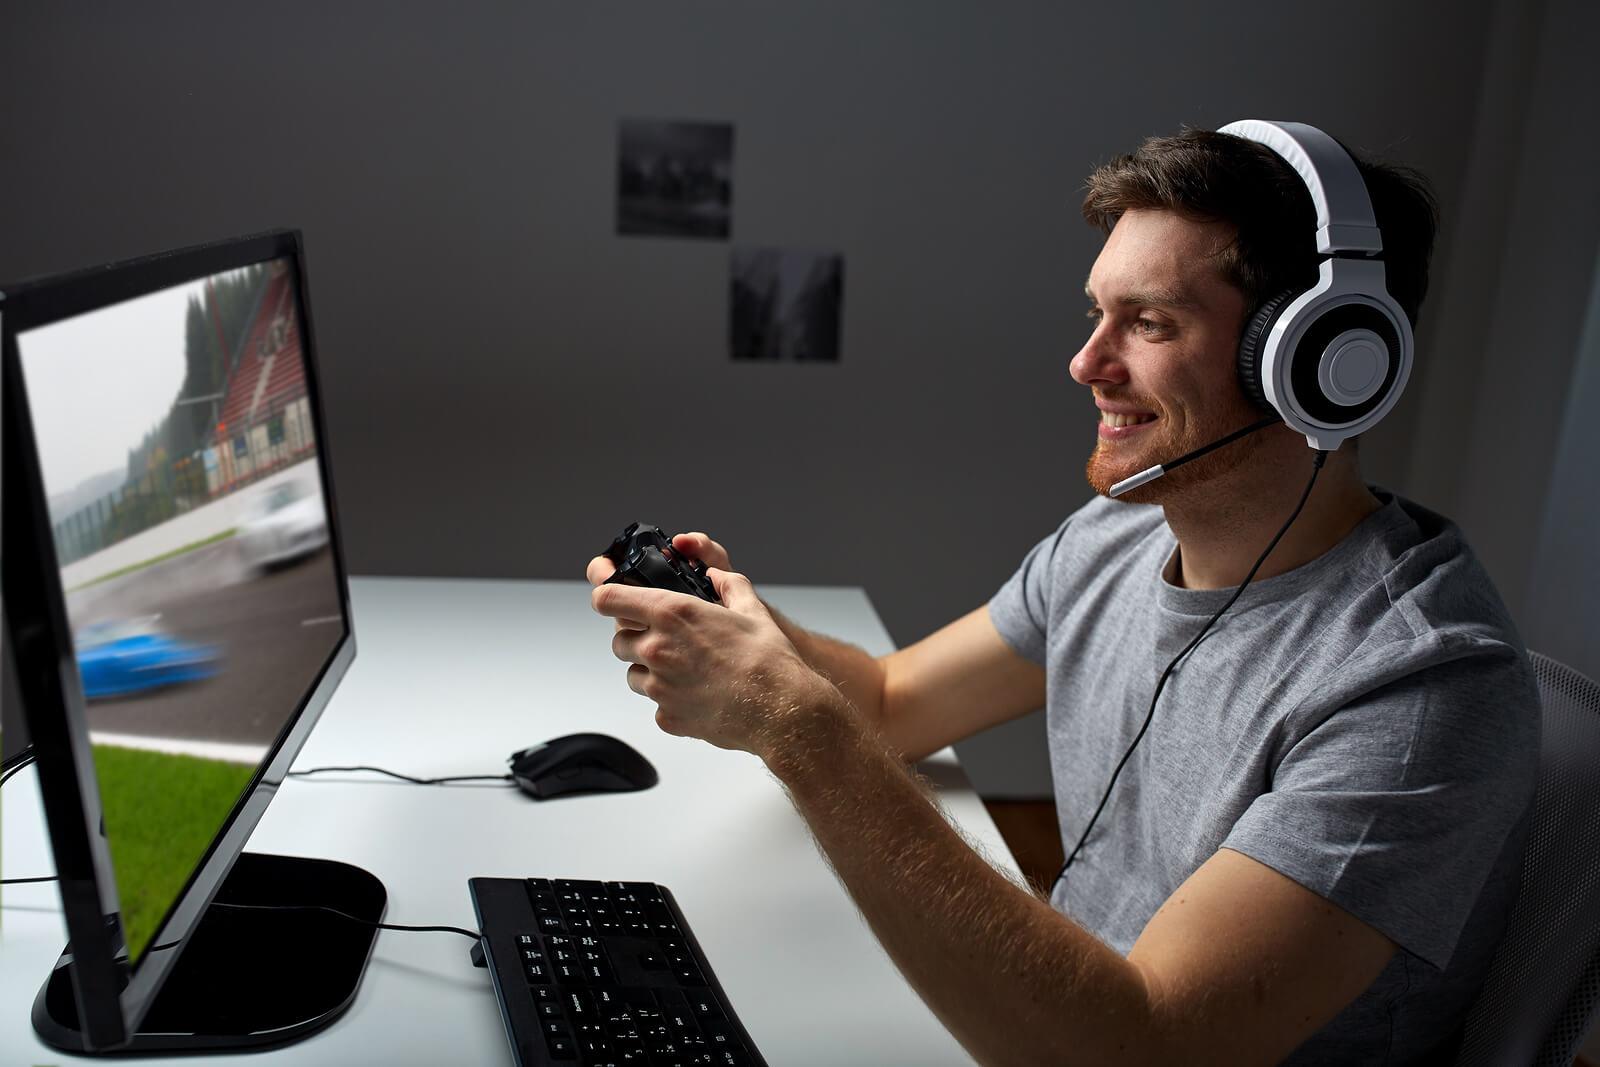 bigstock-technology-gaming-entertainm-125893763-1 - MASKULIN